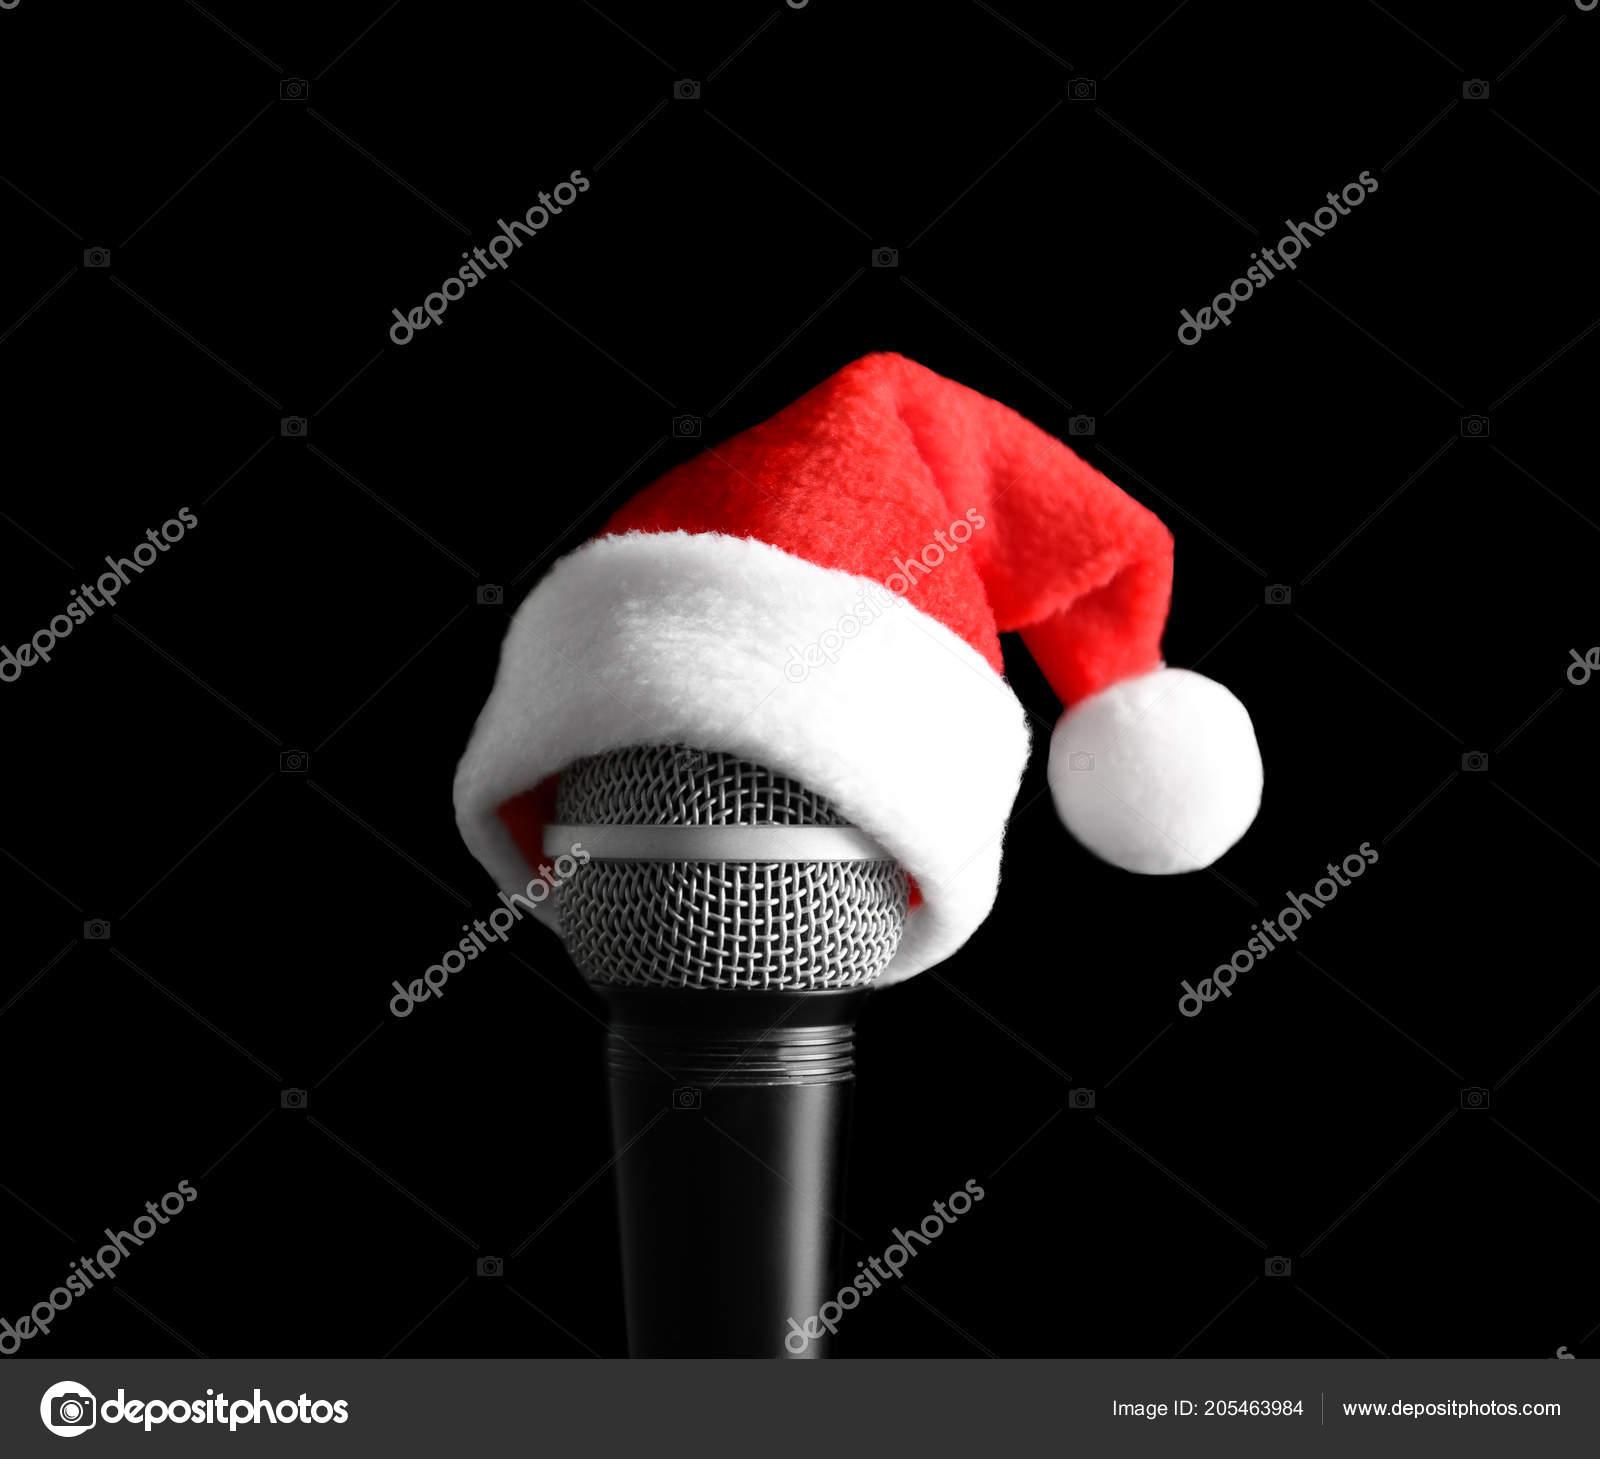 314867c0381c9 Microphone with Santa hat on black background. Christmas music concept —  Photo by liudmilachernetska gmail.com